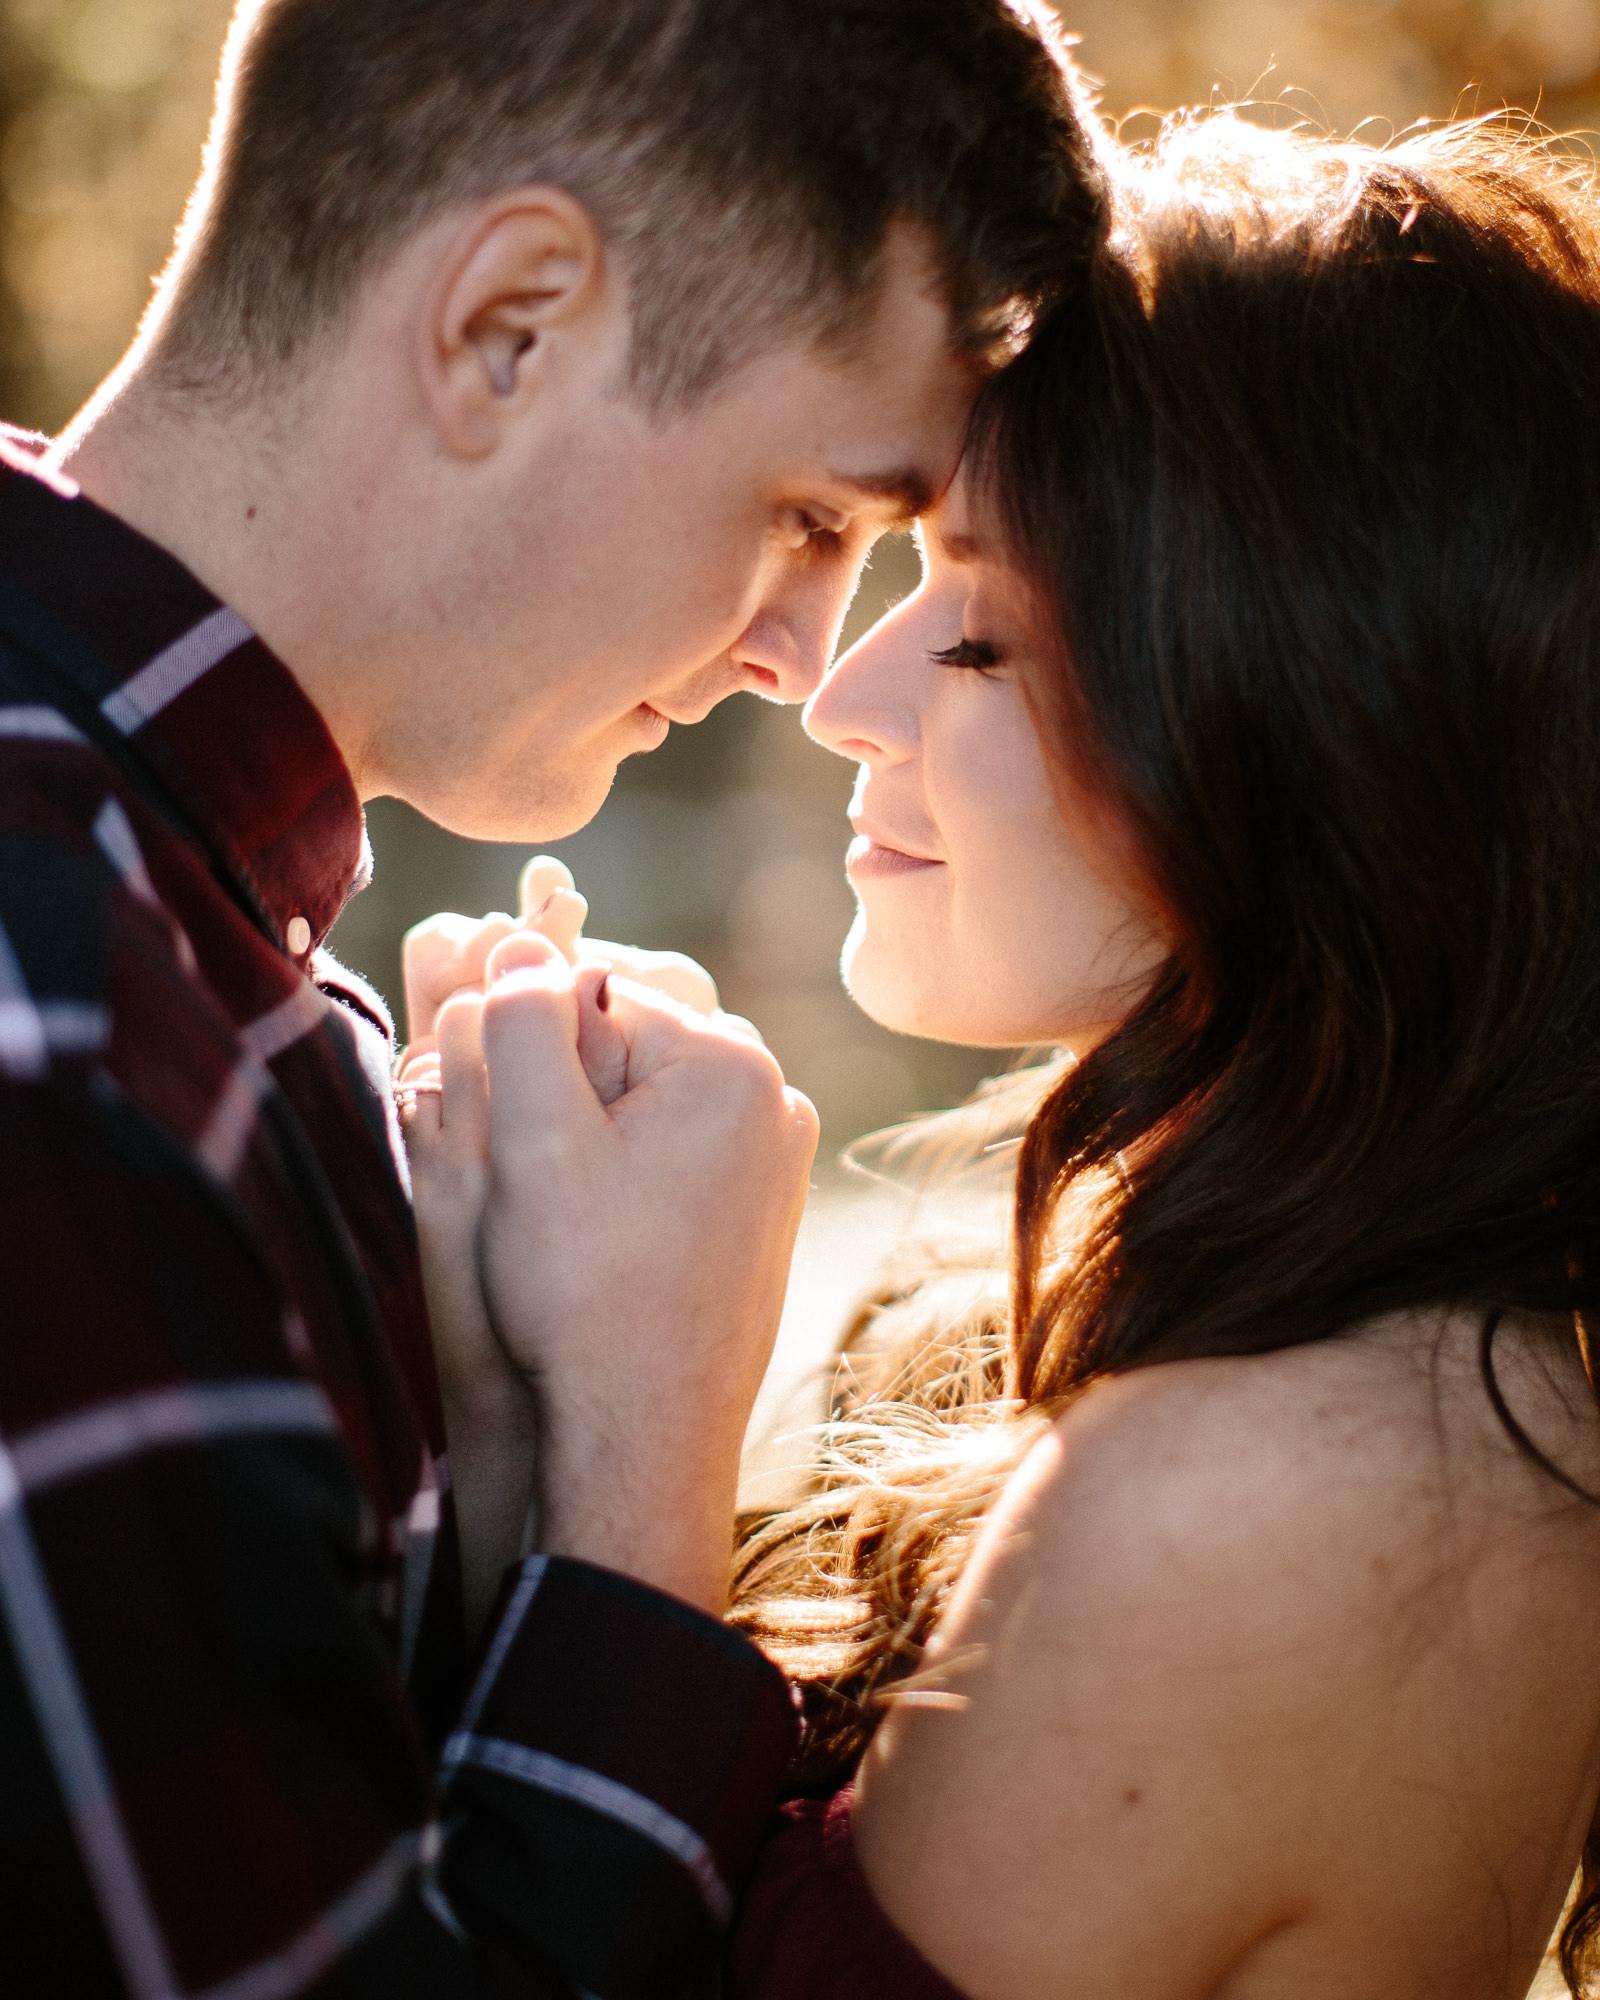 wedding-elopement-adventerous-romantic-timeless-des-moines-siouxfalls-photography-07.jpg